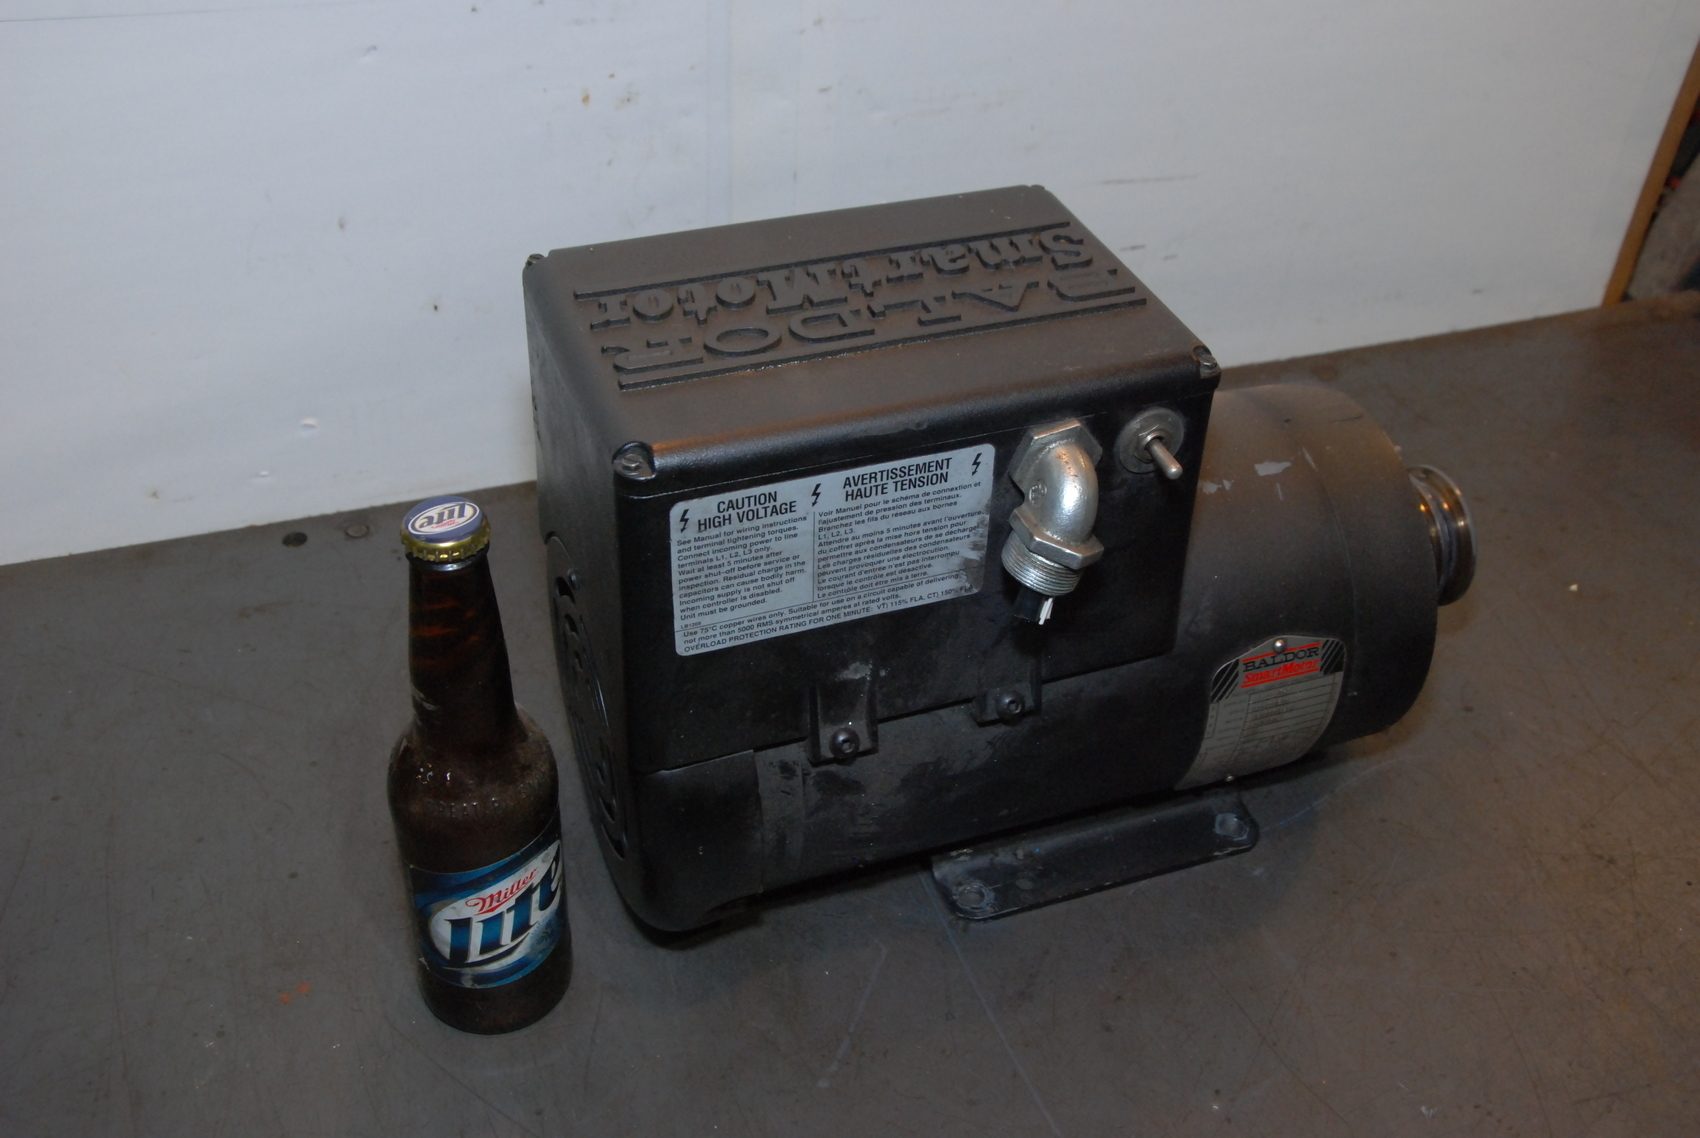 Baldor AC Motor SmartMotor CSM3558T-2,2 HP,230 Volt,3 PHASE